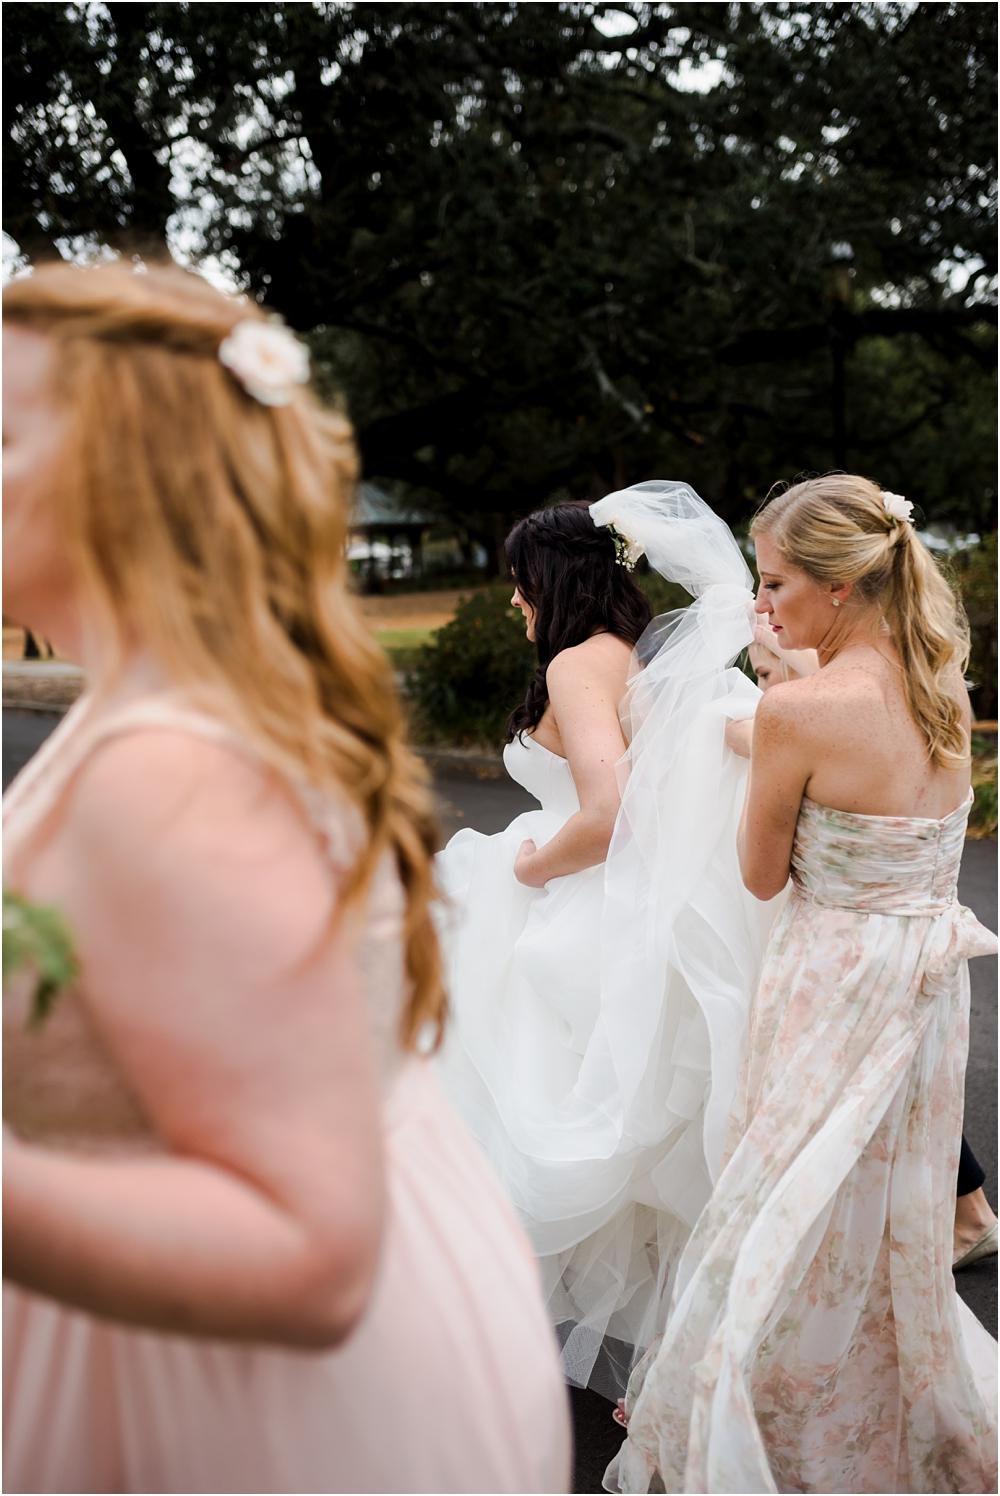 pensacola-wedding-photographer-kiersten-grant-88.jpg